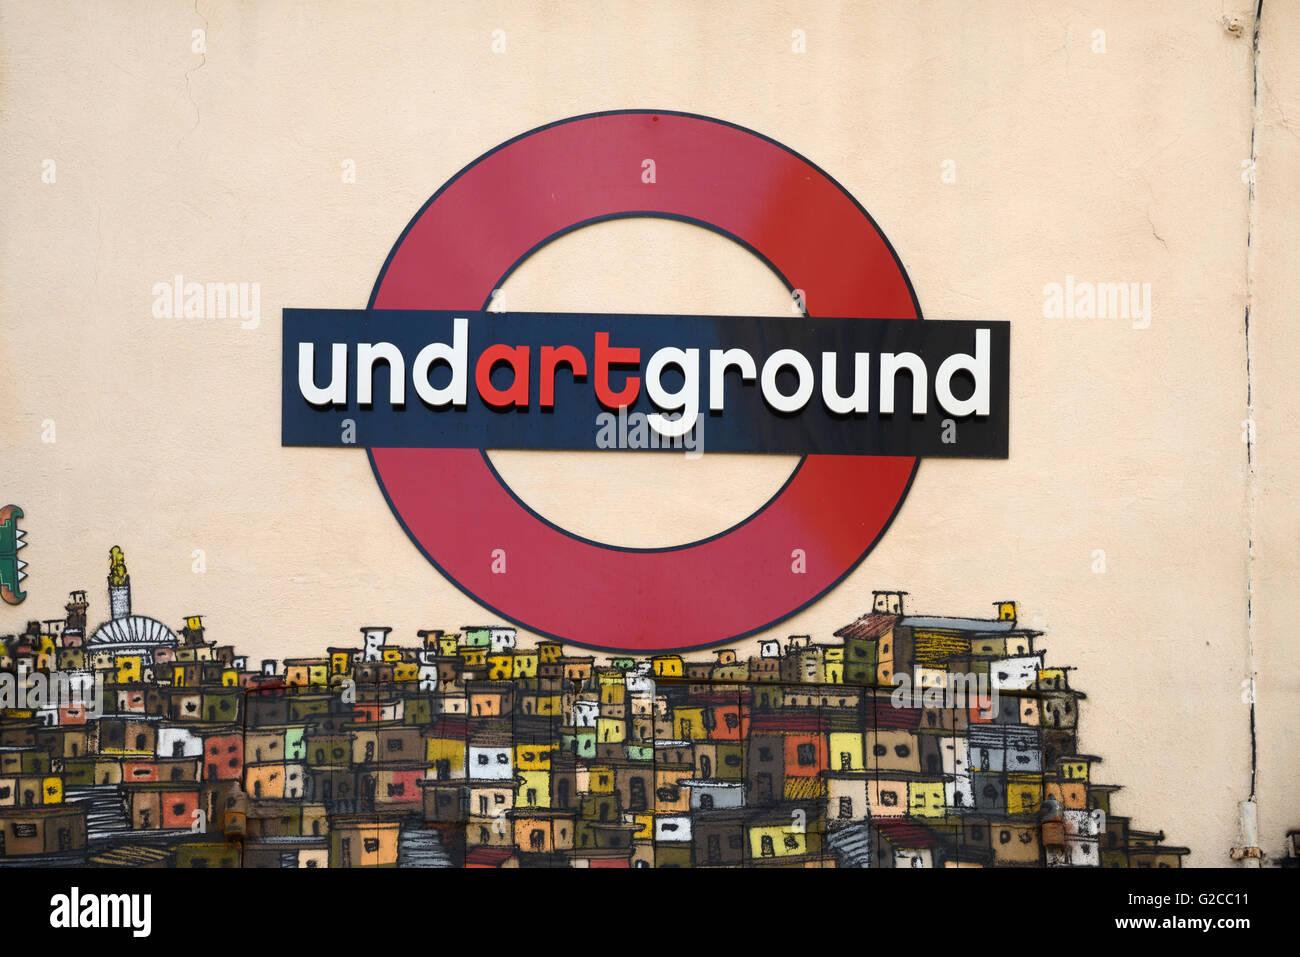 Undartground Art Wall Painting based on London Underground Sign or Motif Panier Marseille or Marseilles France - Stock Image